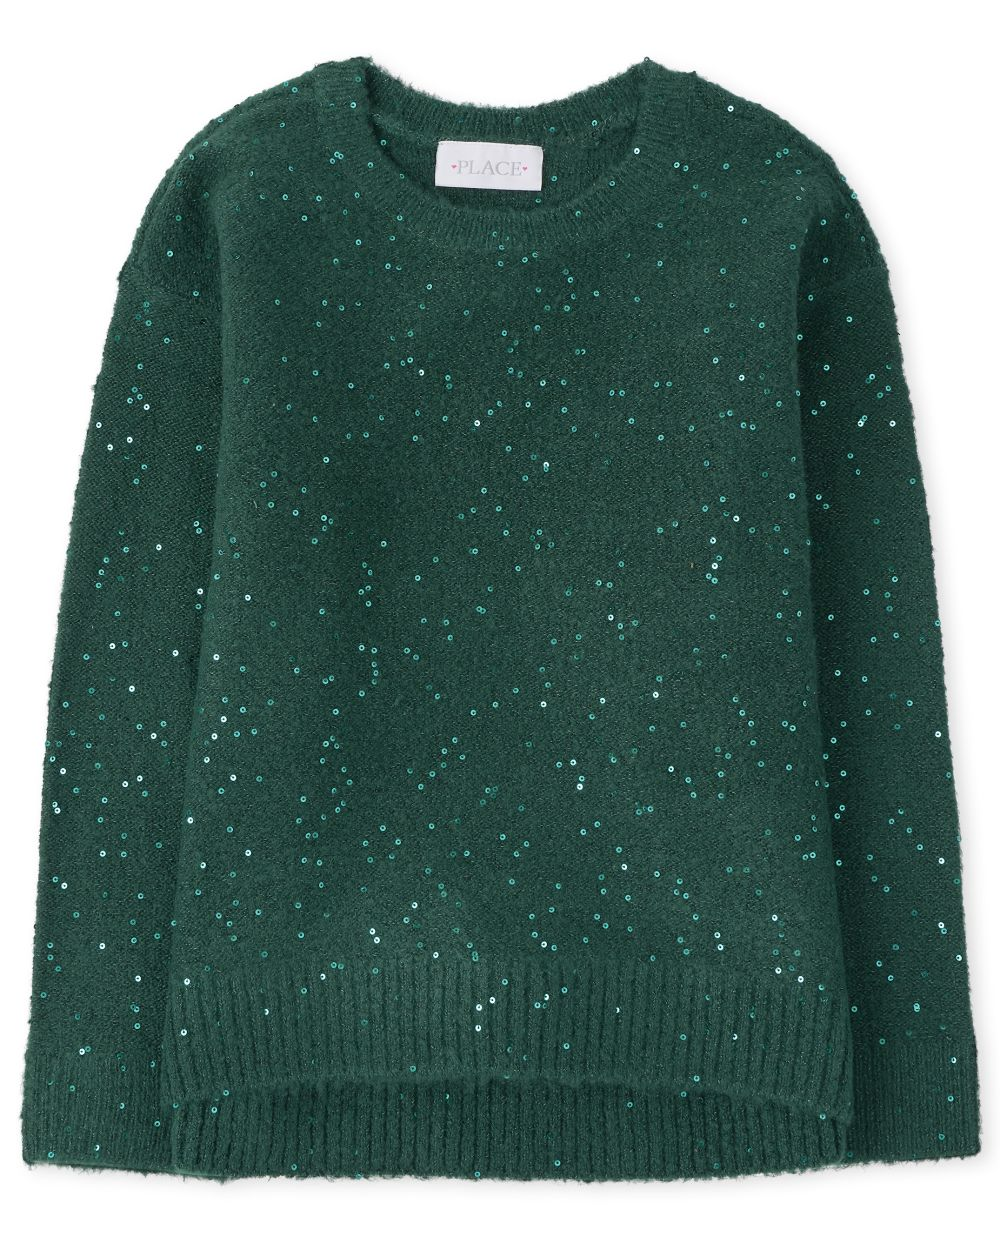 Girls Sequin Sweater